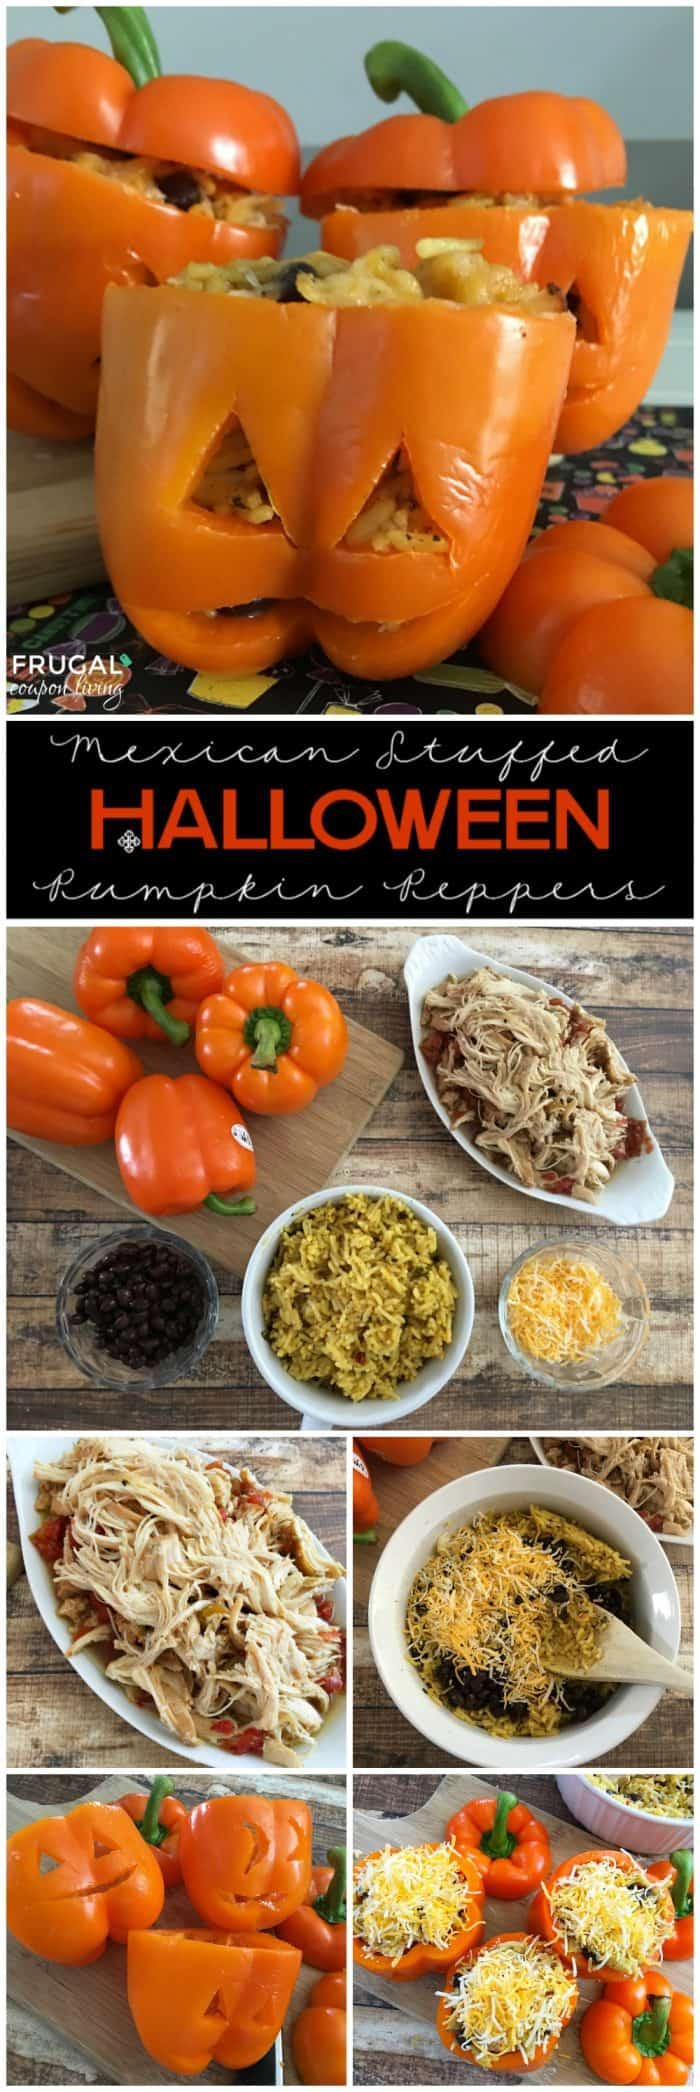 Mexican-Stuffed-Halloween-Pumpkin-Peppers-Frugal-Coupon-Living-long